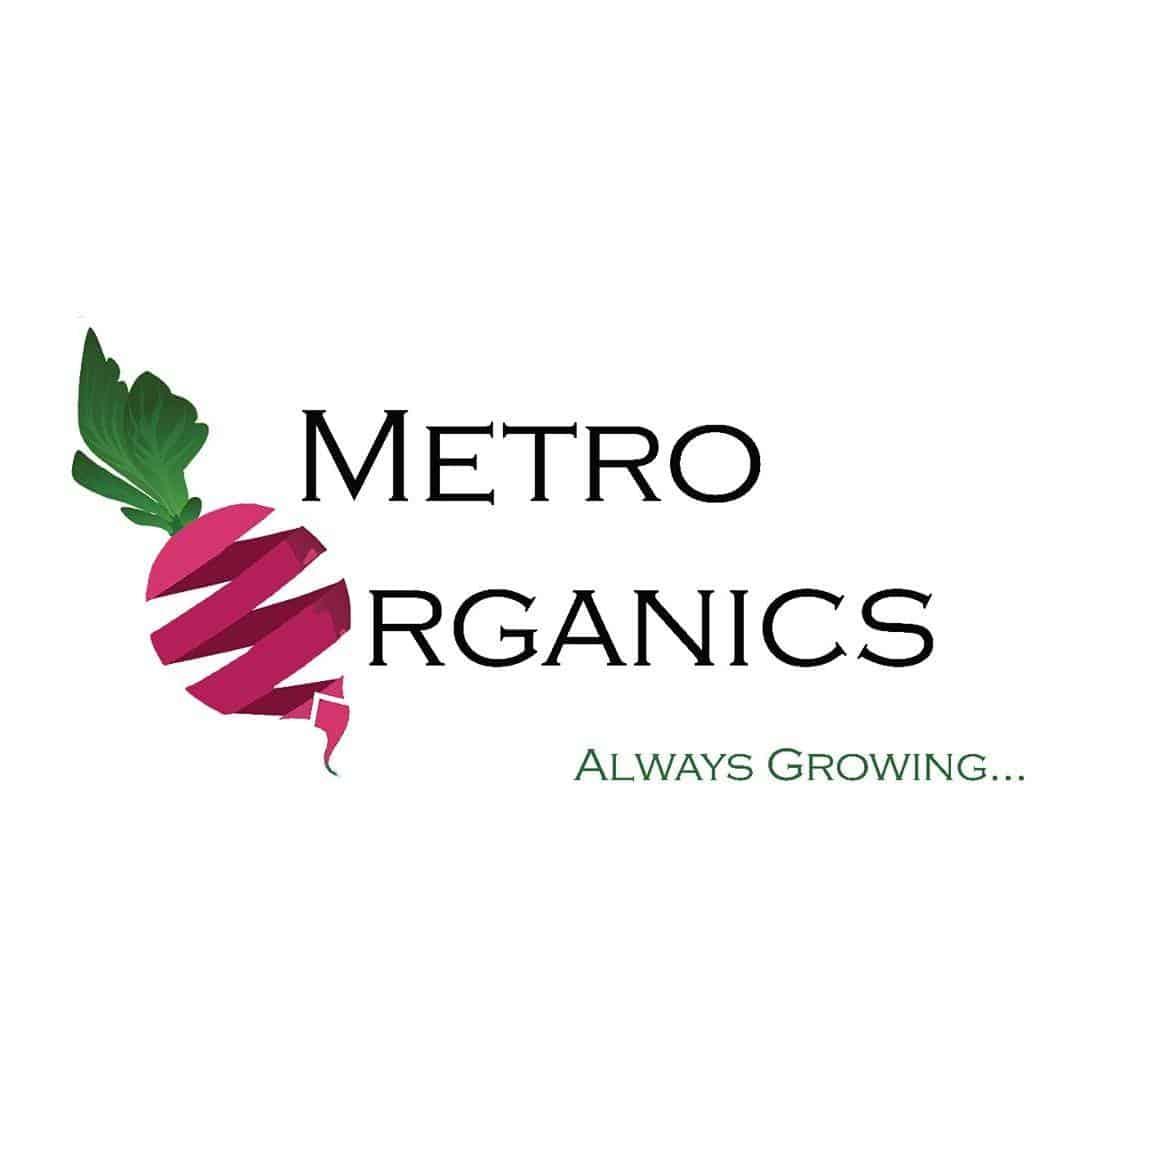 Metro Organics